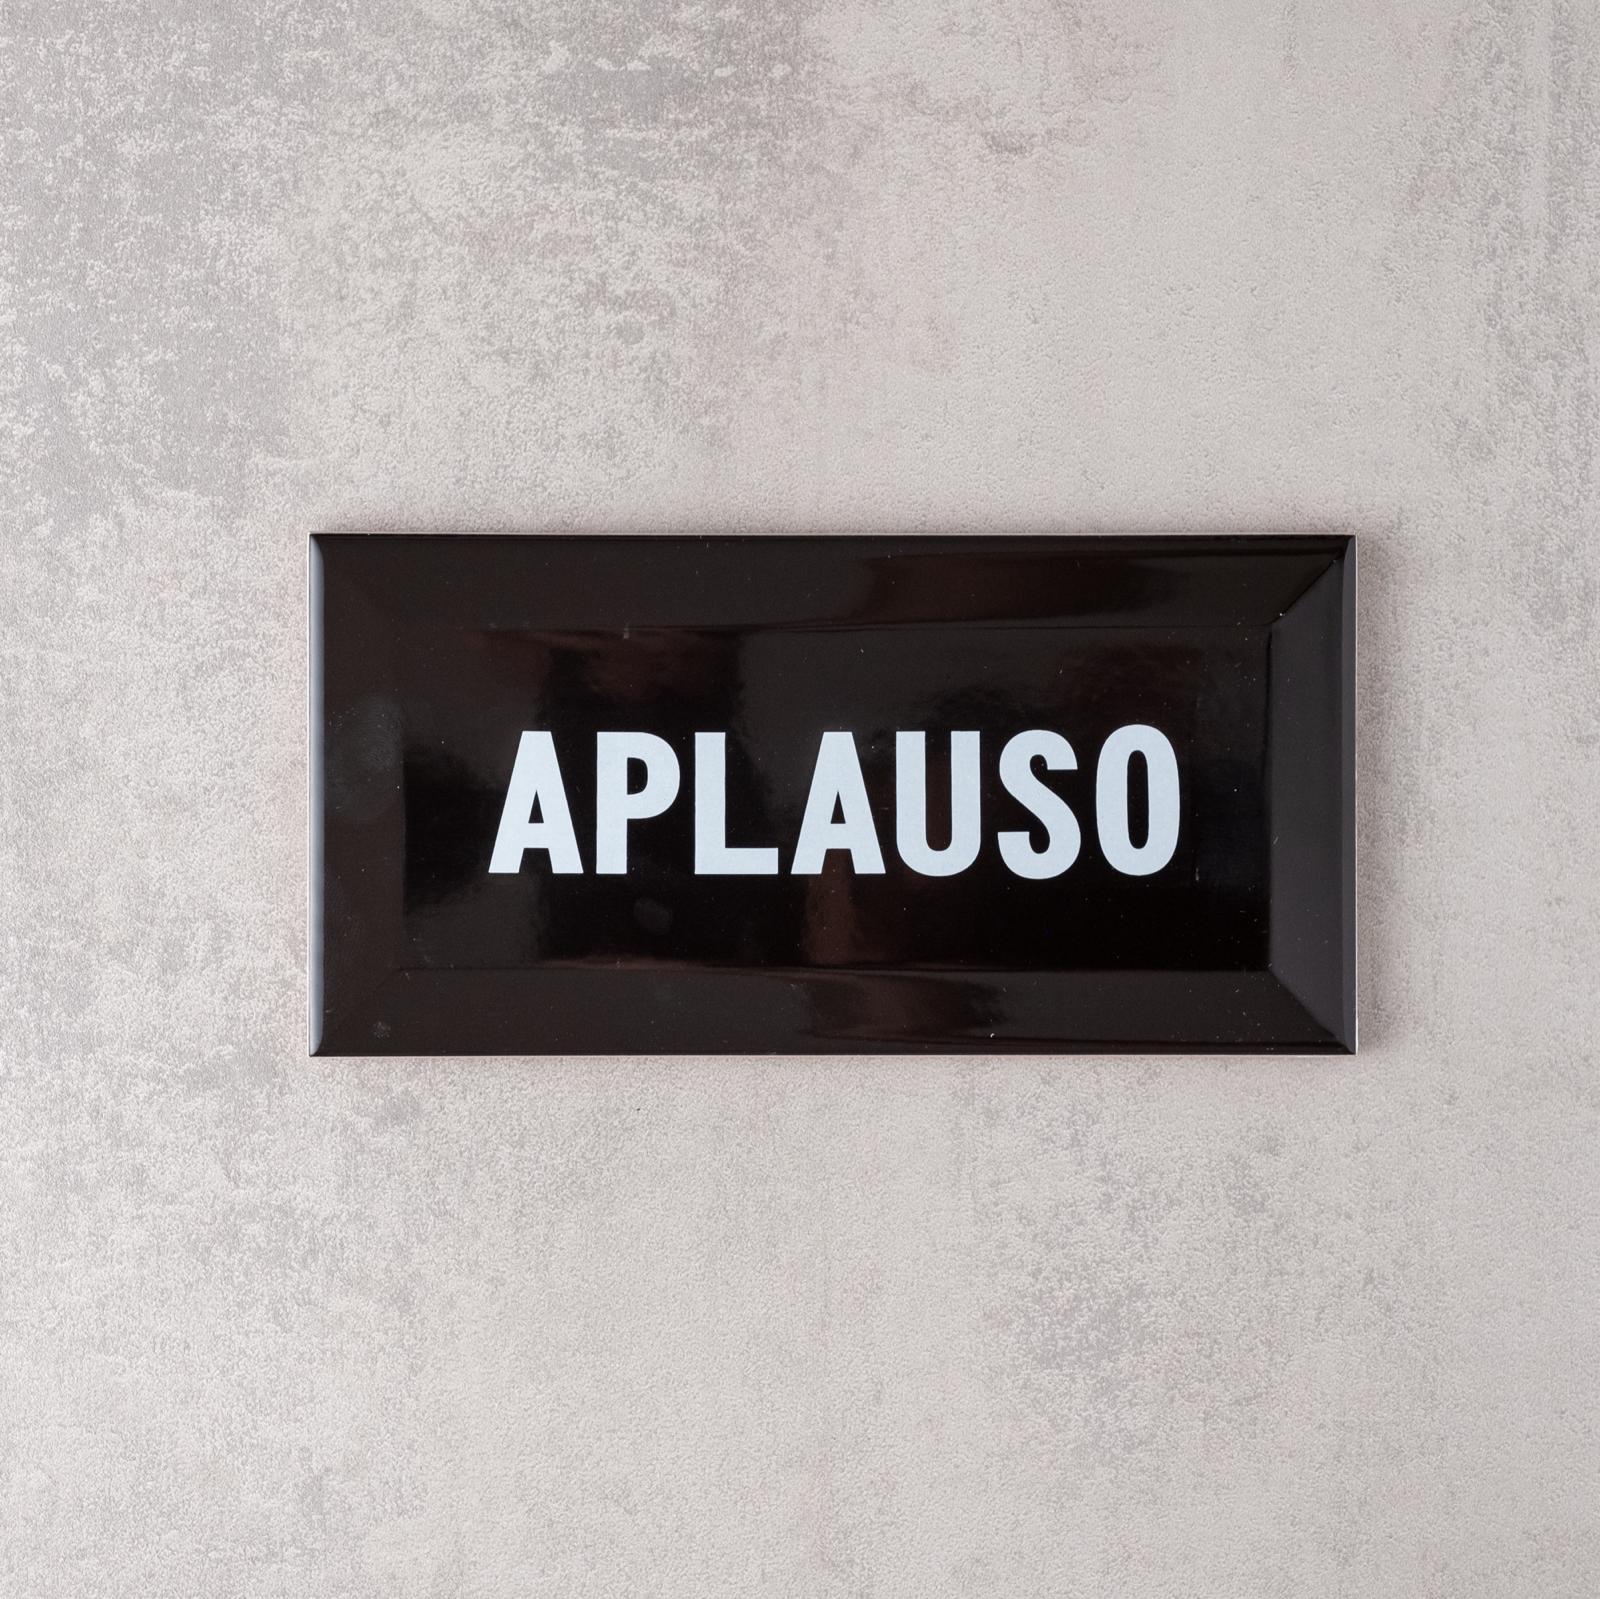 AZULEJO APLAUSO